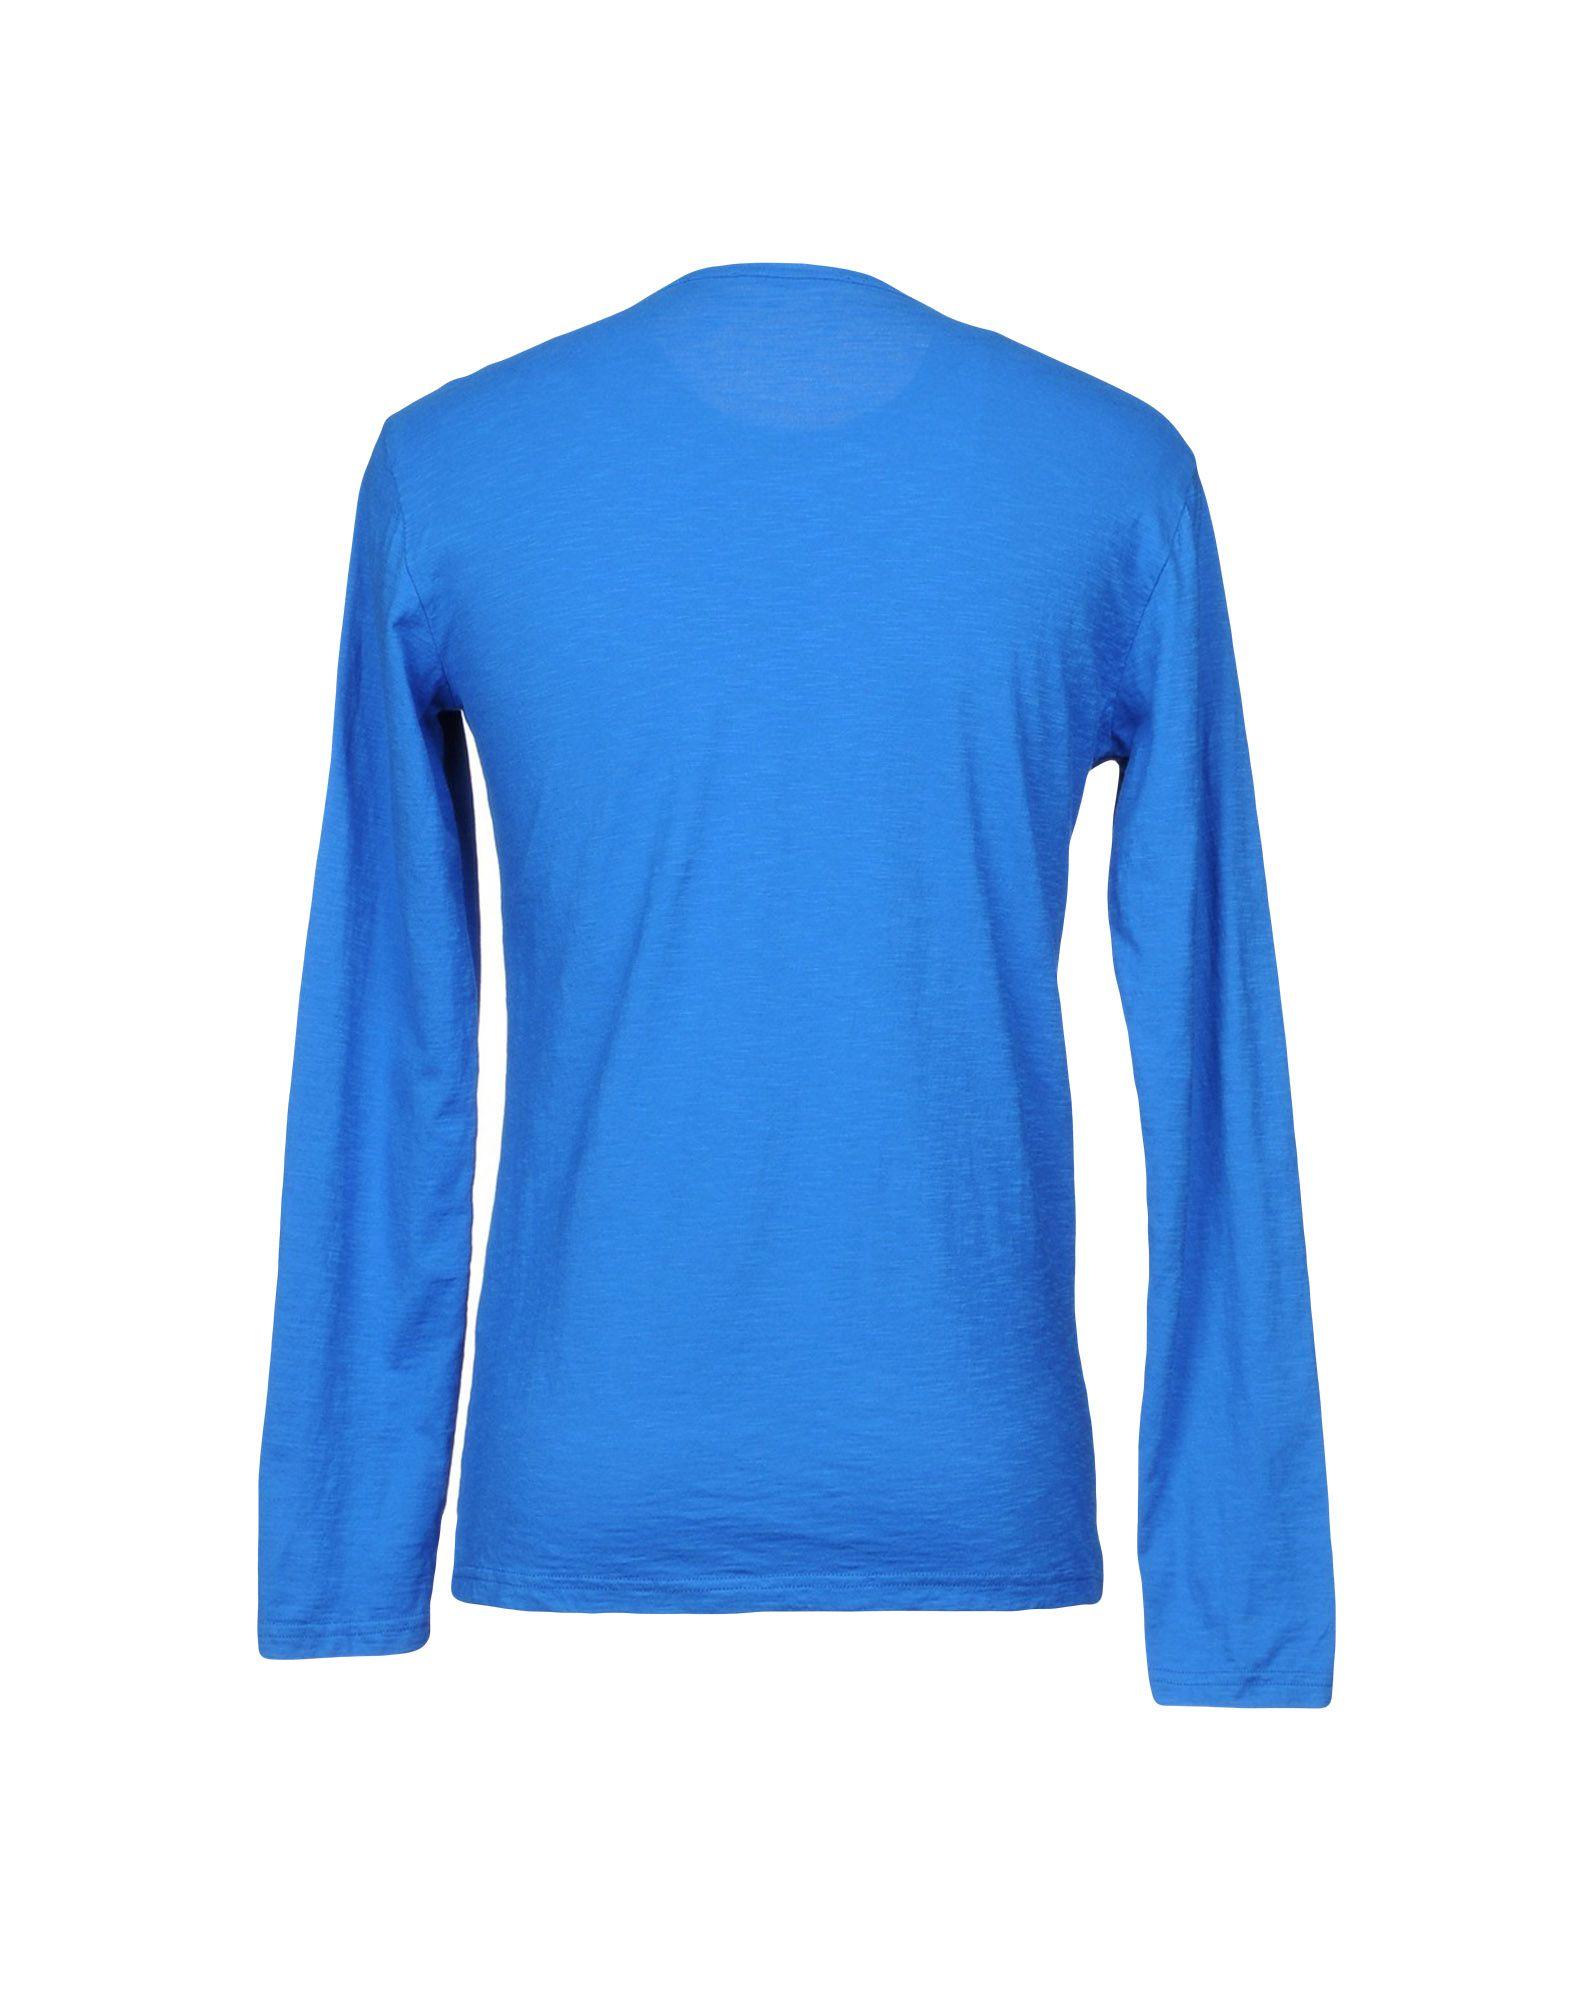 T-Shirt Daniele Alessandrini Uomo Uomo Alessandrini - 12077436BI b71cce